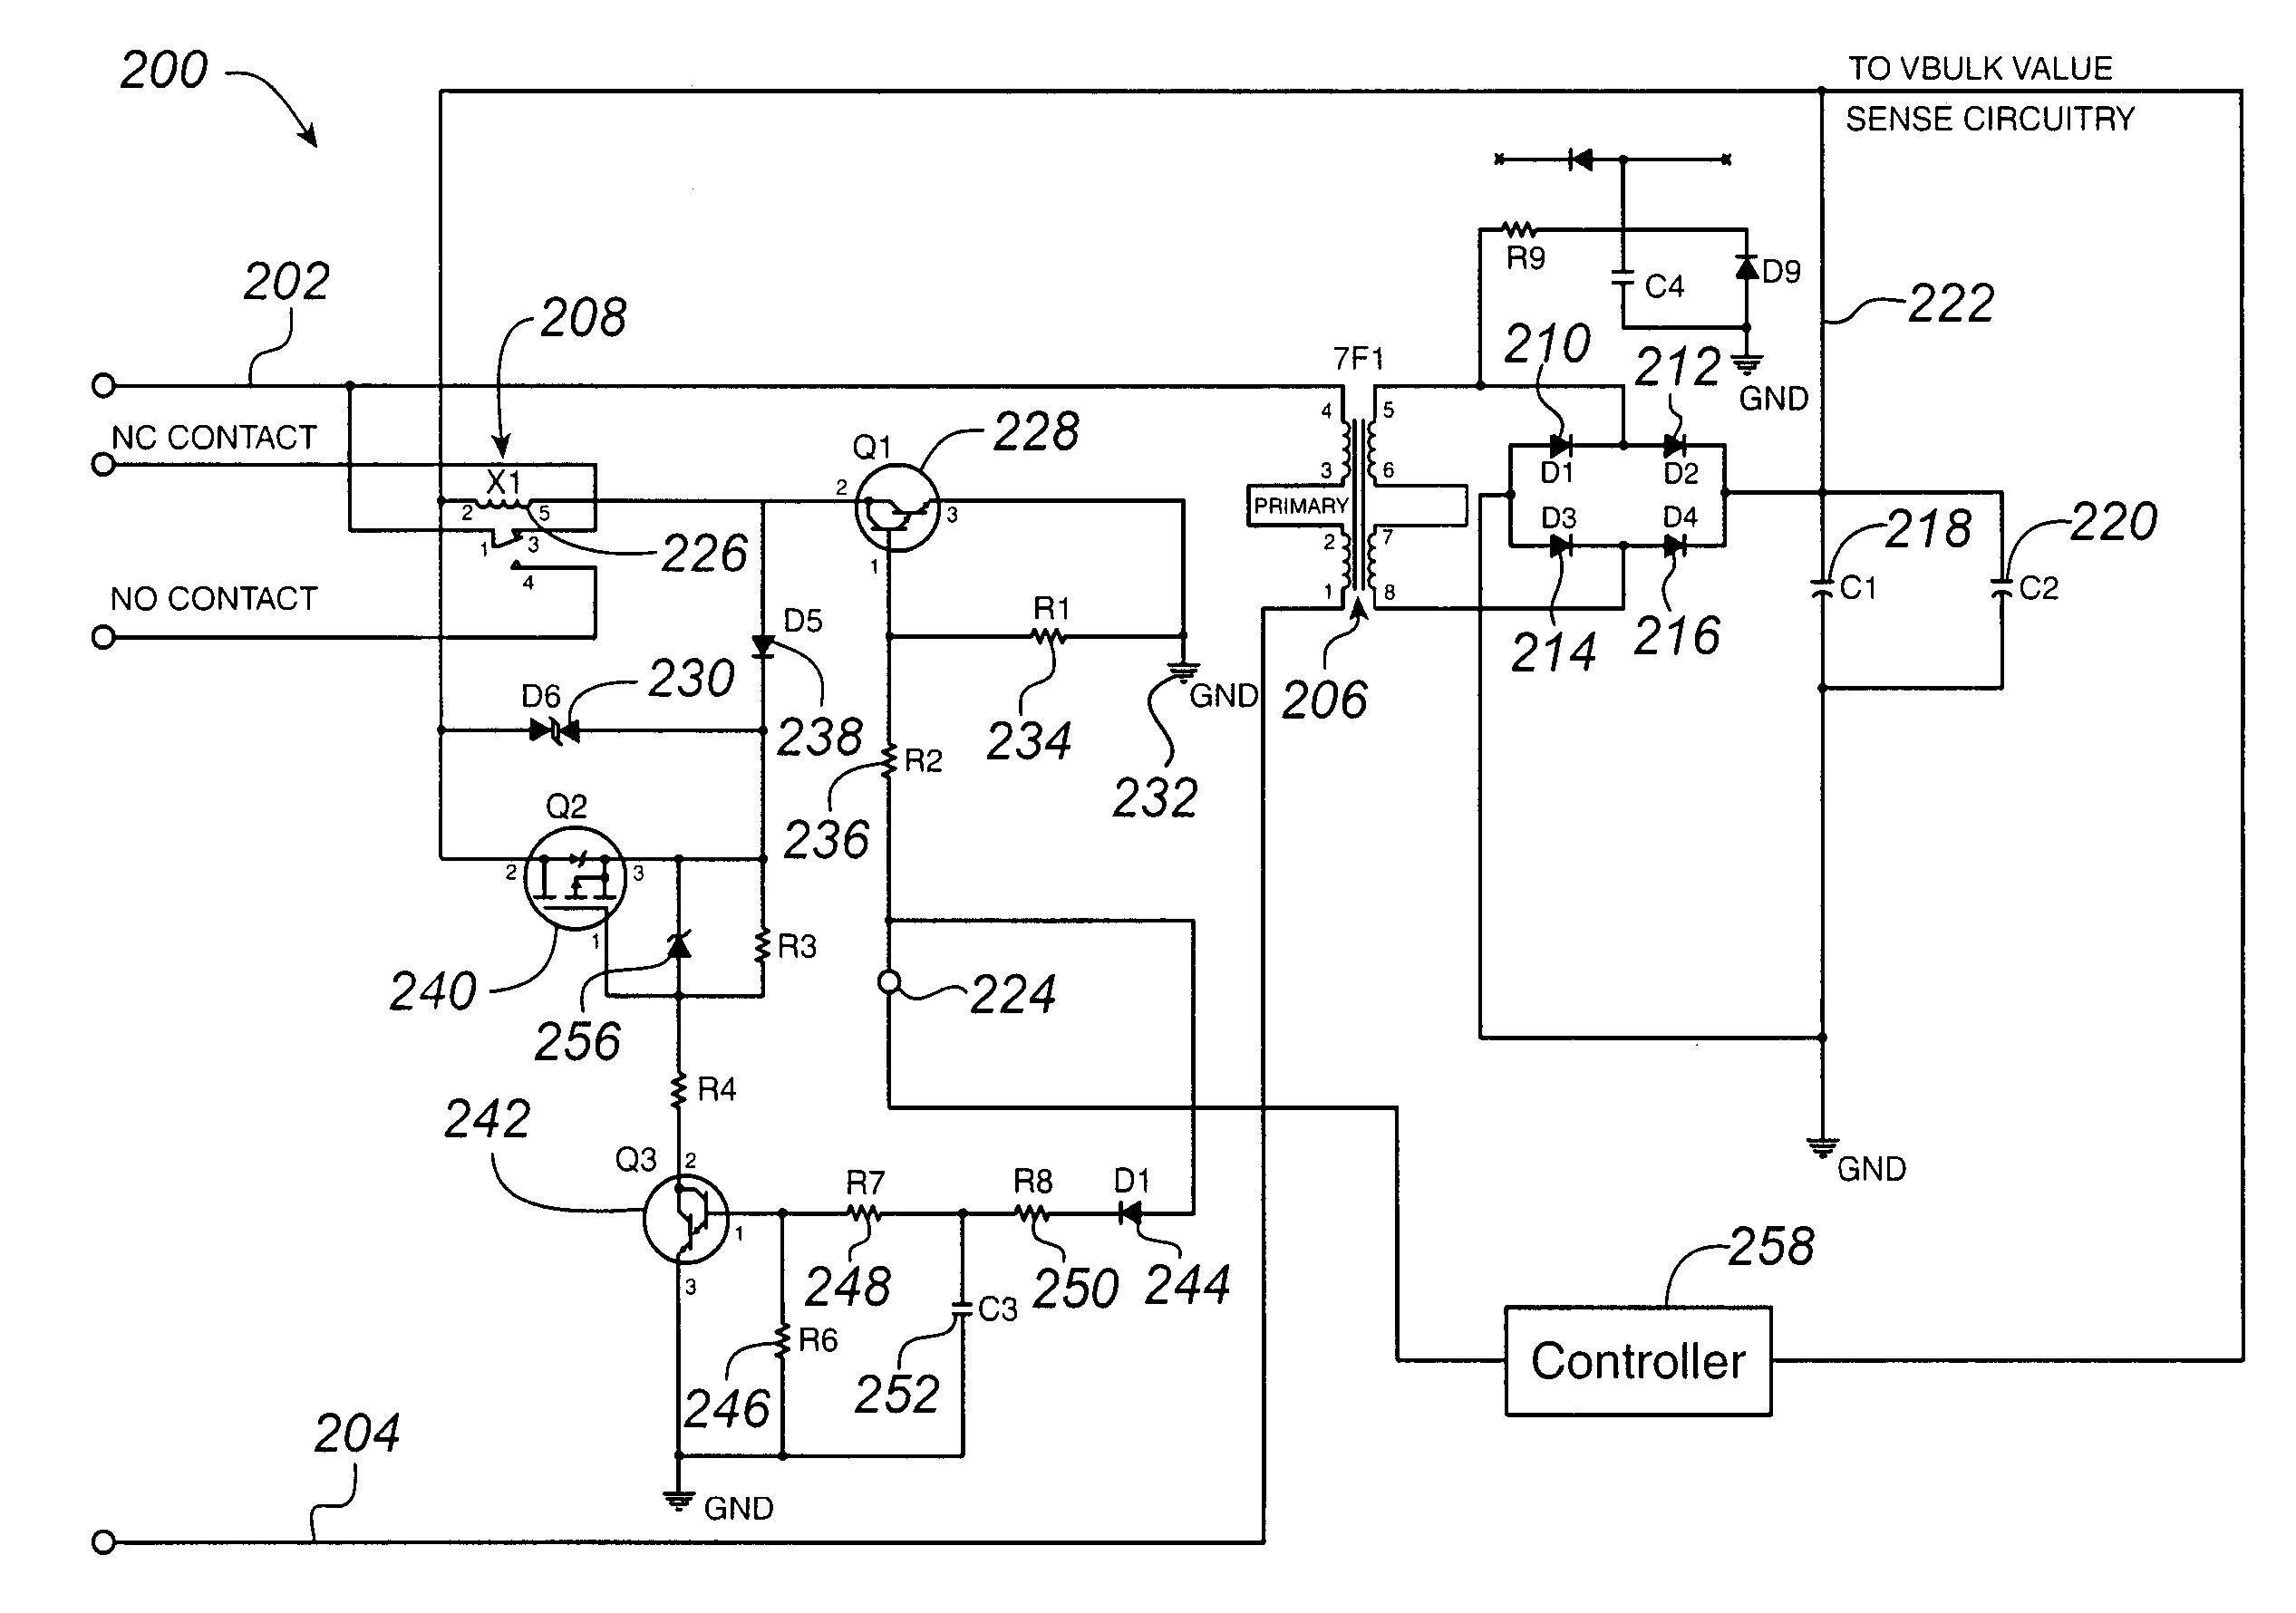 Wiring Diagram Walk In Freezer - Wiring Diagram Review on